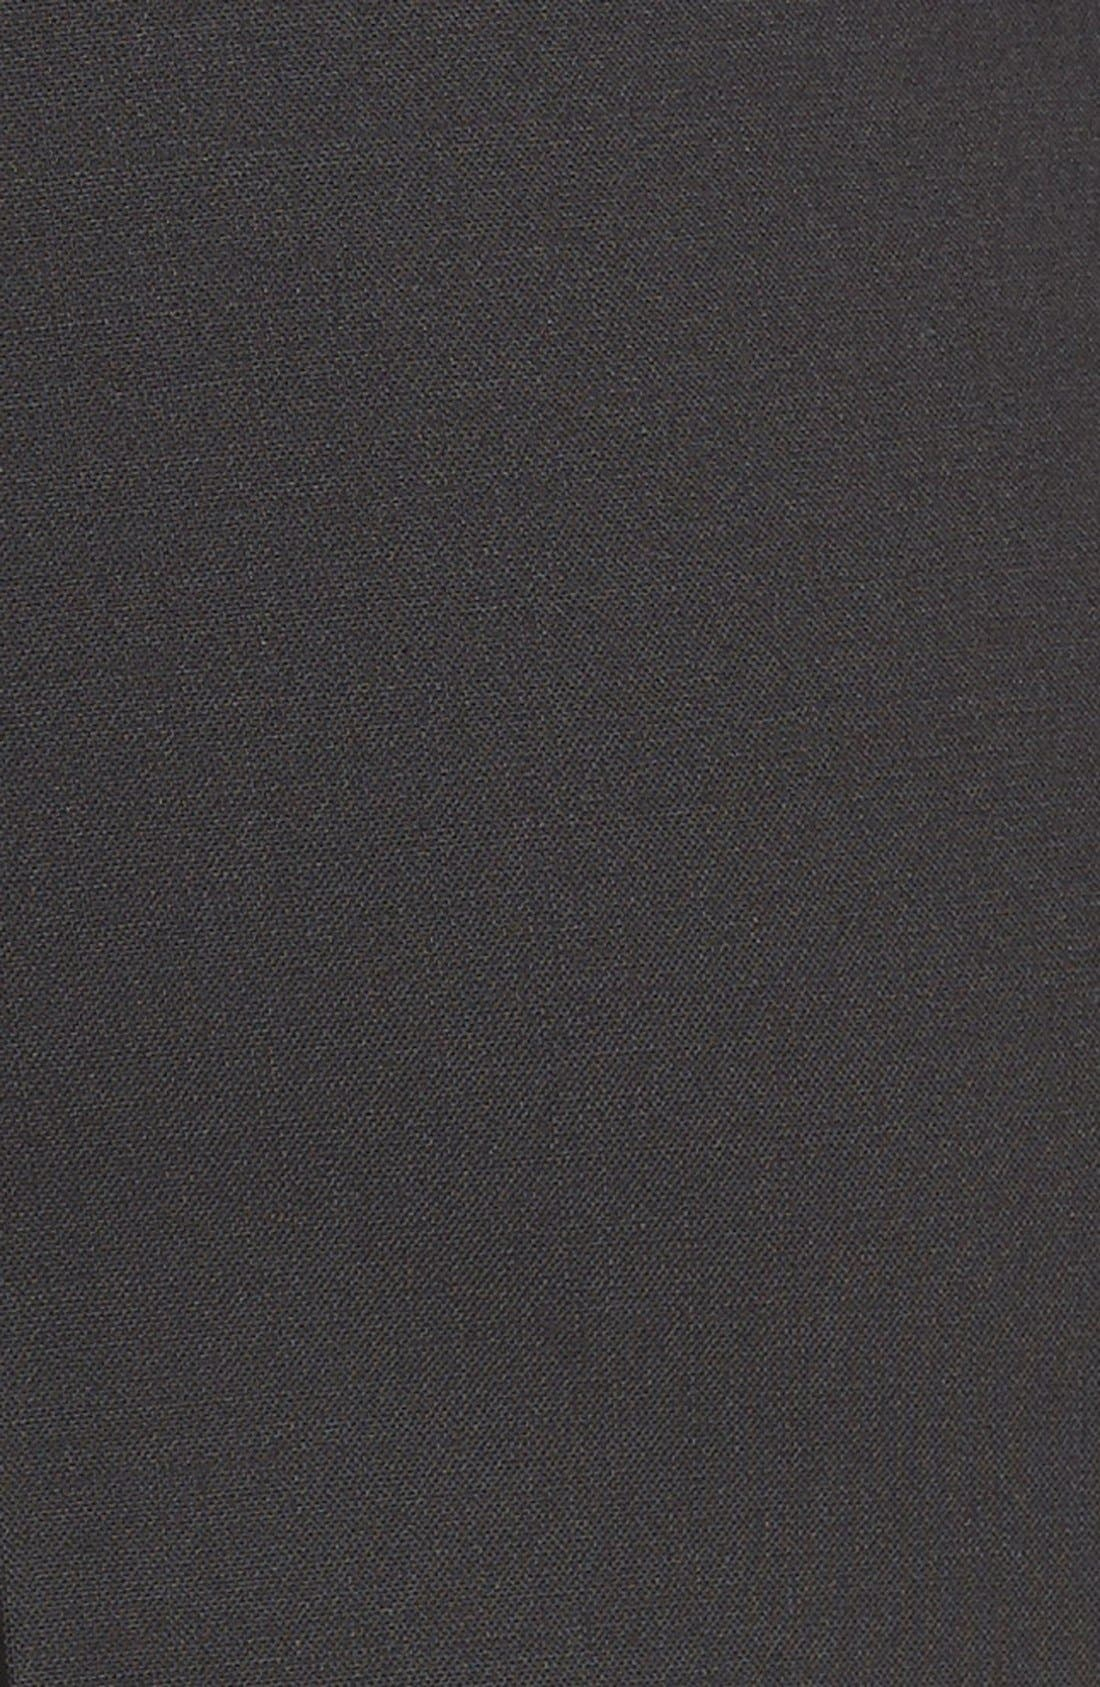 Tiluna Tropical Stretch Wool Ankle Trousers,                             Alternate thumbnail 5, color,                             BLACK